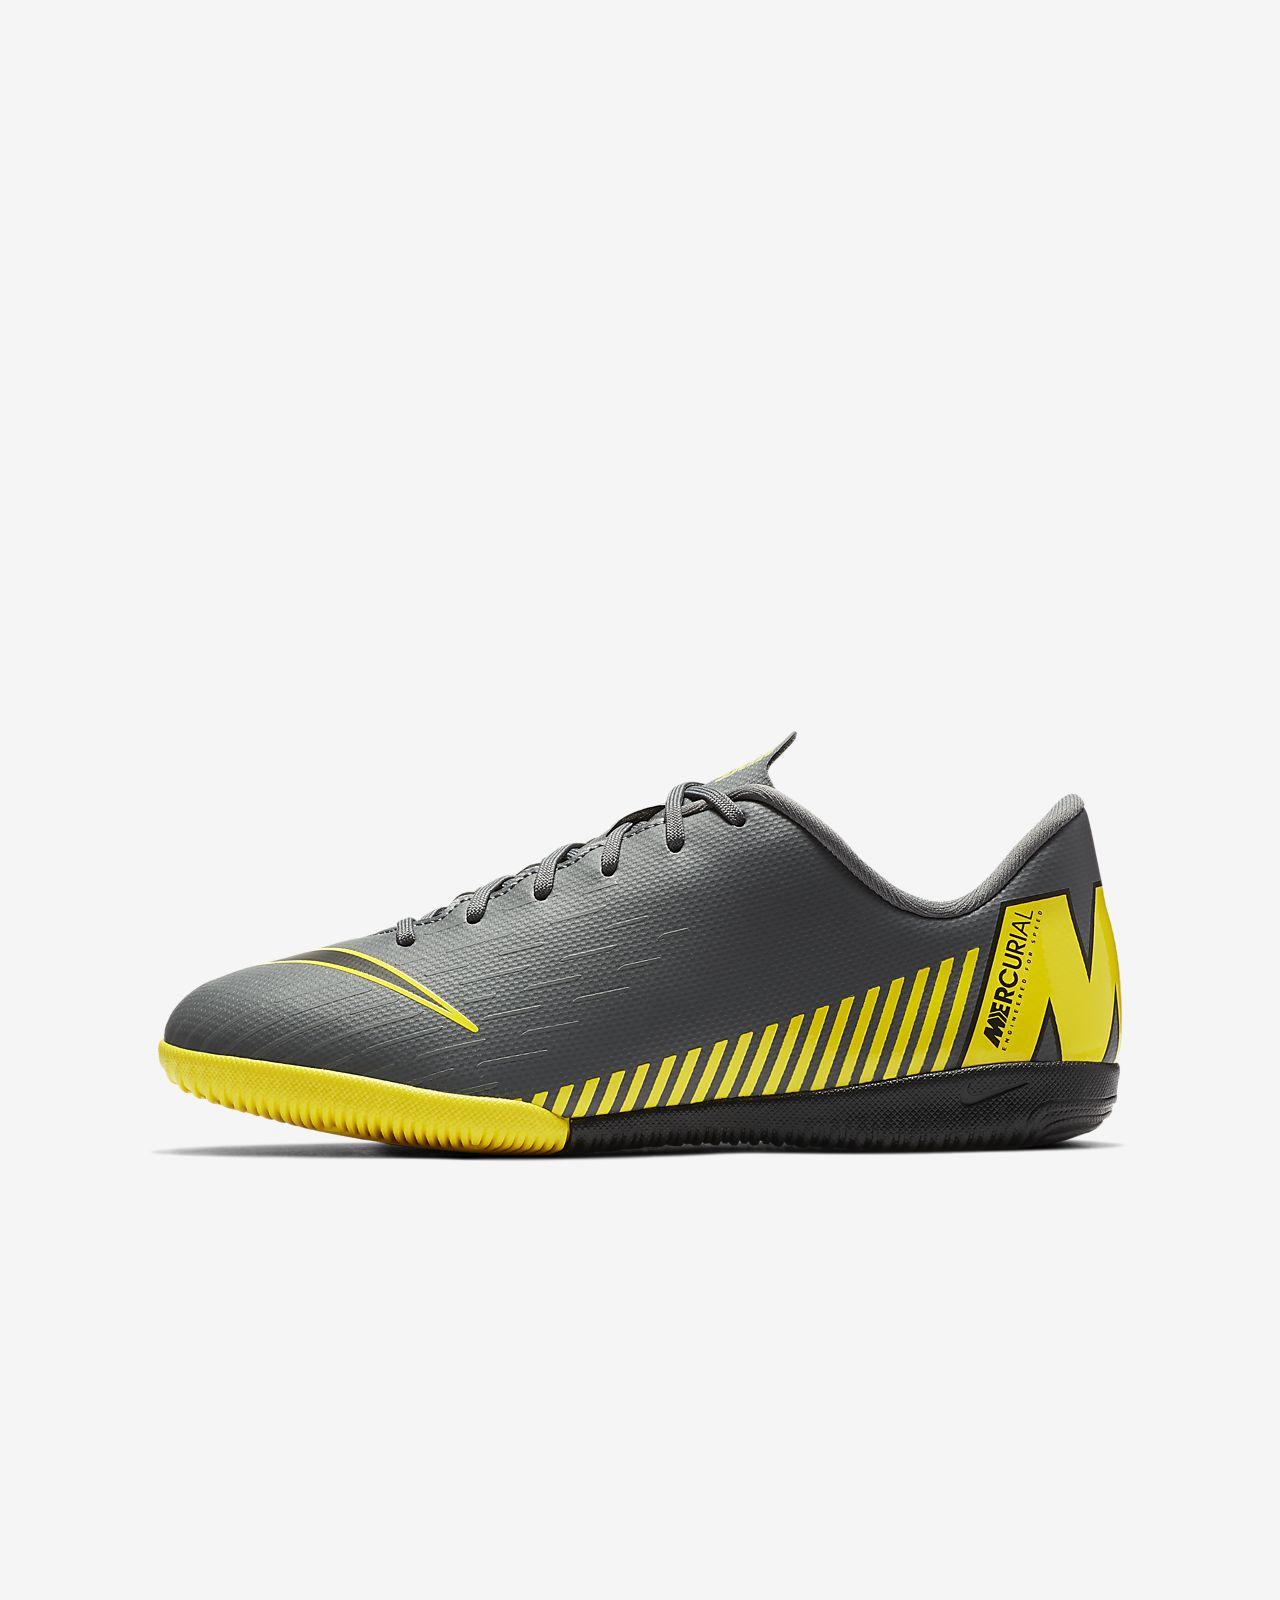 829929b17ebd8 ... Nike Jr. VaporX 12 Academy IC Game Over Botas de fútbol sala - Niño